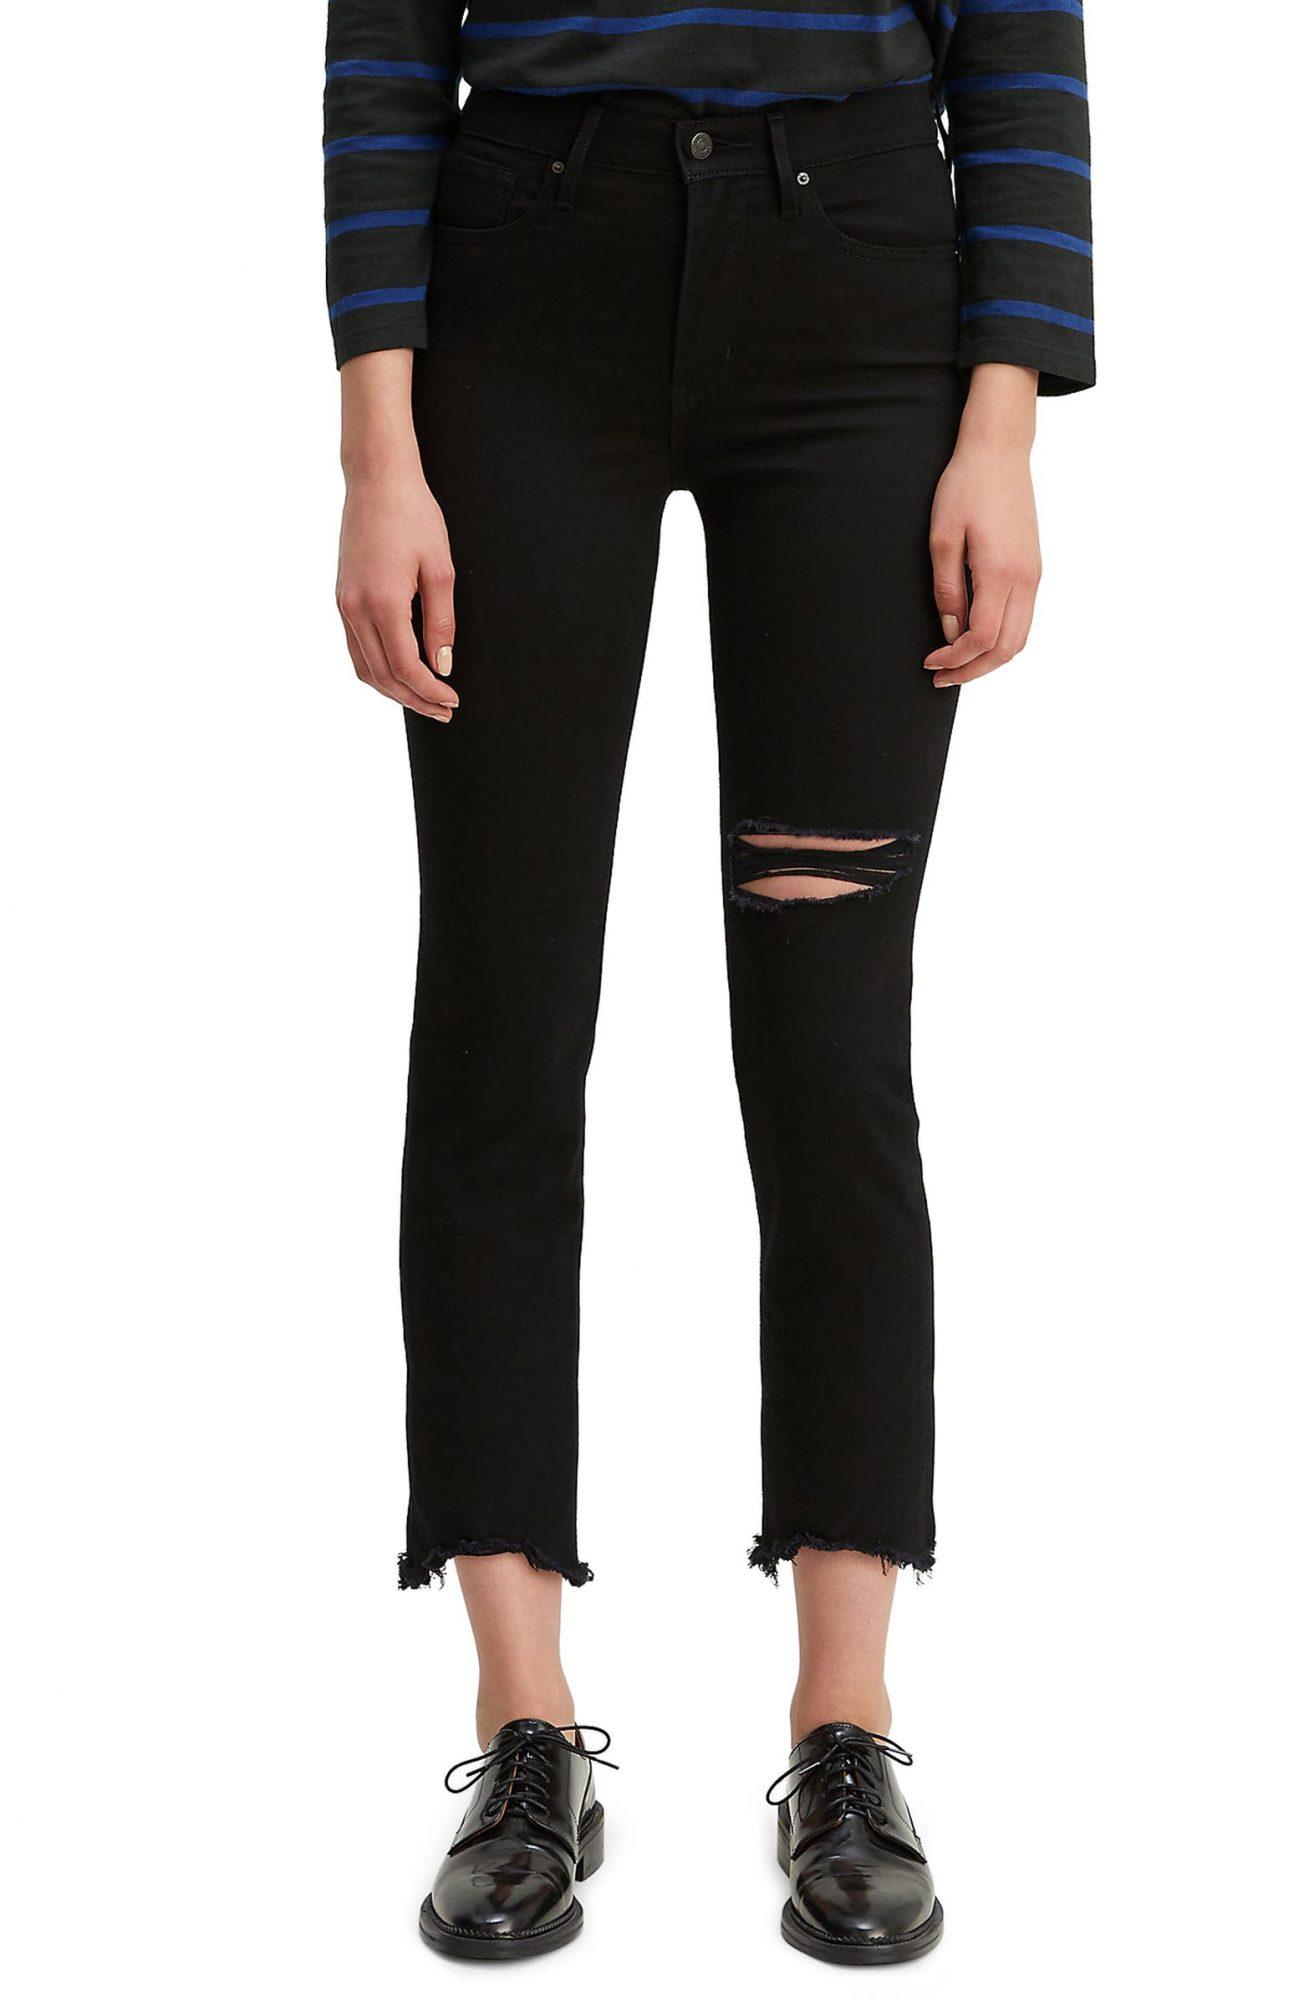 levi's ripped black jeans